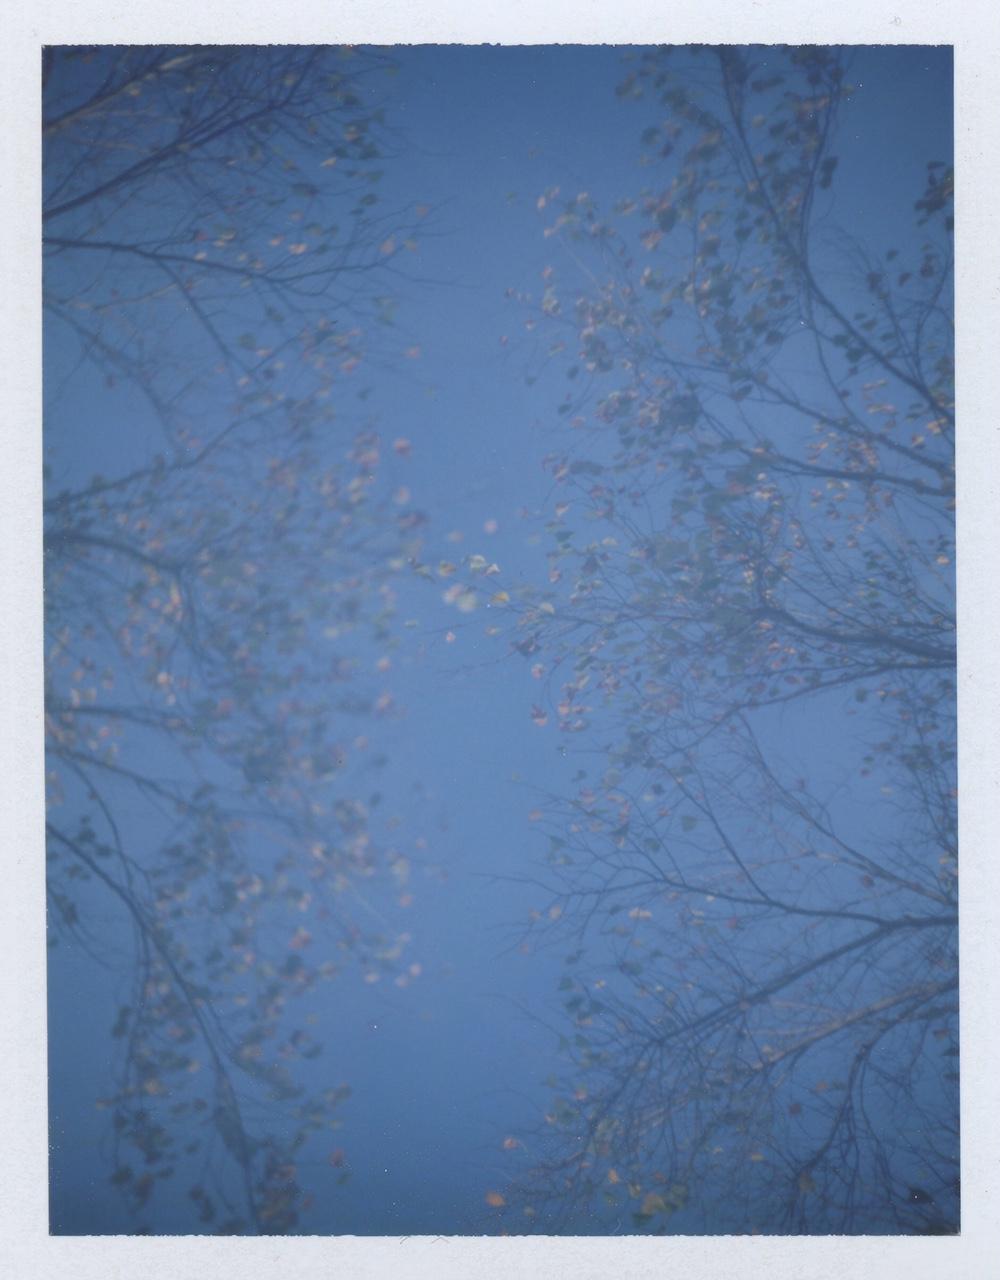 All images Polaroid Colorpack, Fuji FP100C film